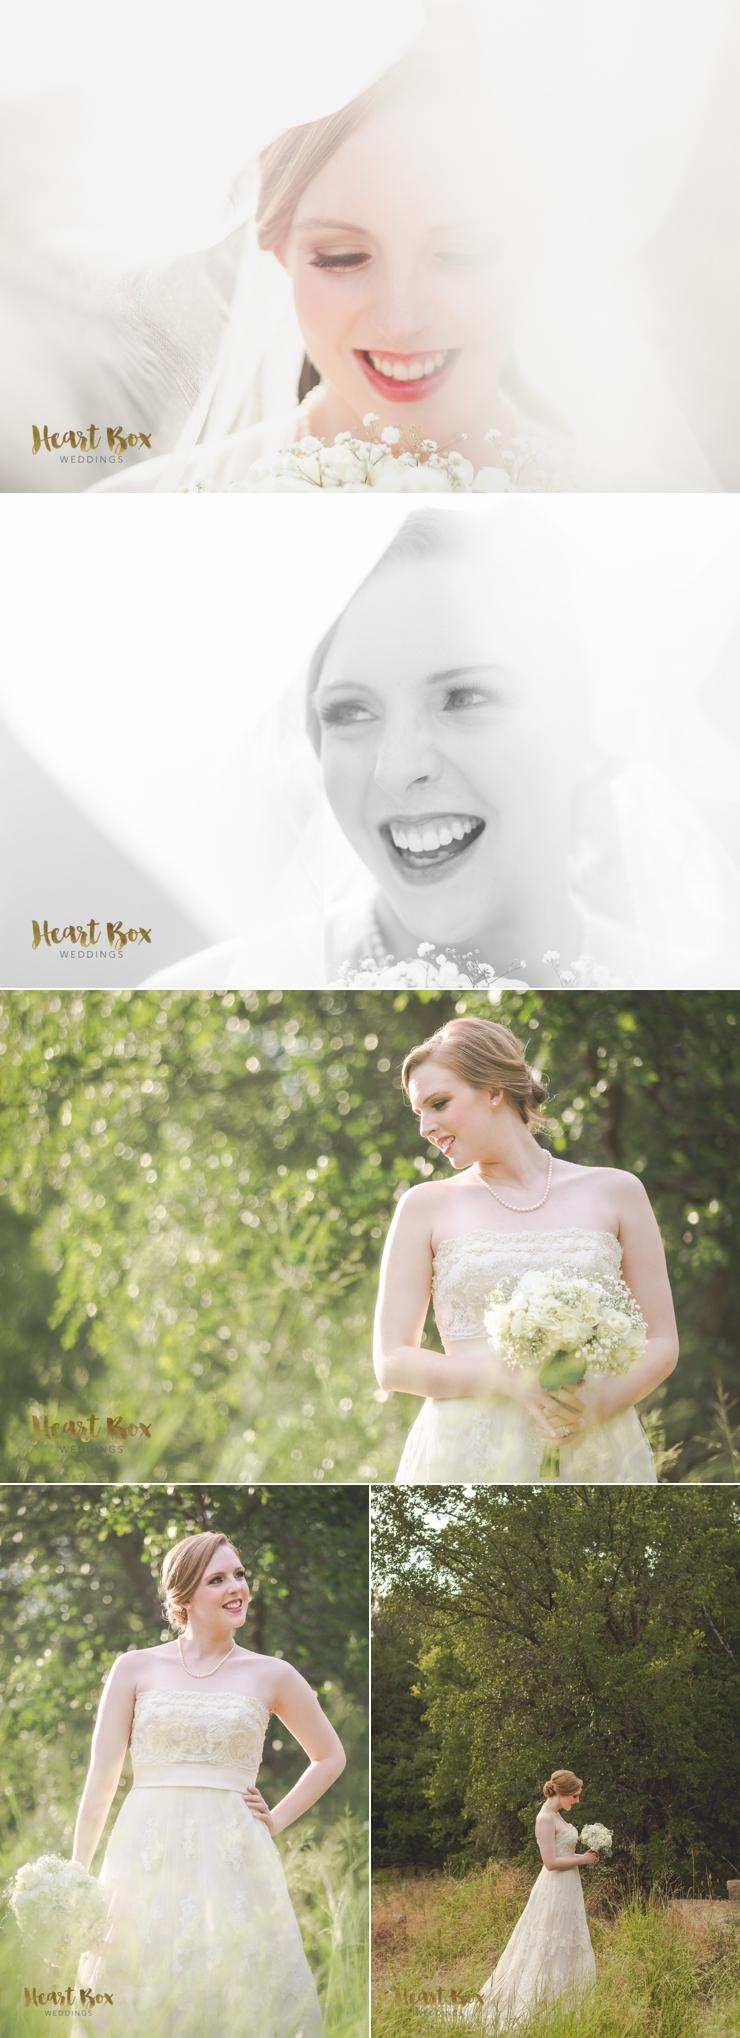 Kaylin Bridal Blog Collages 3.jpg